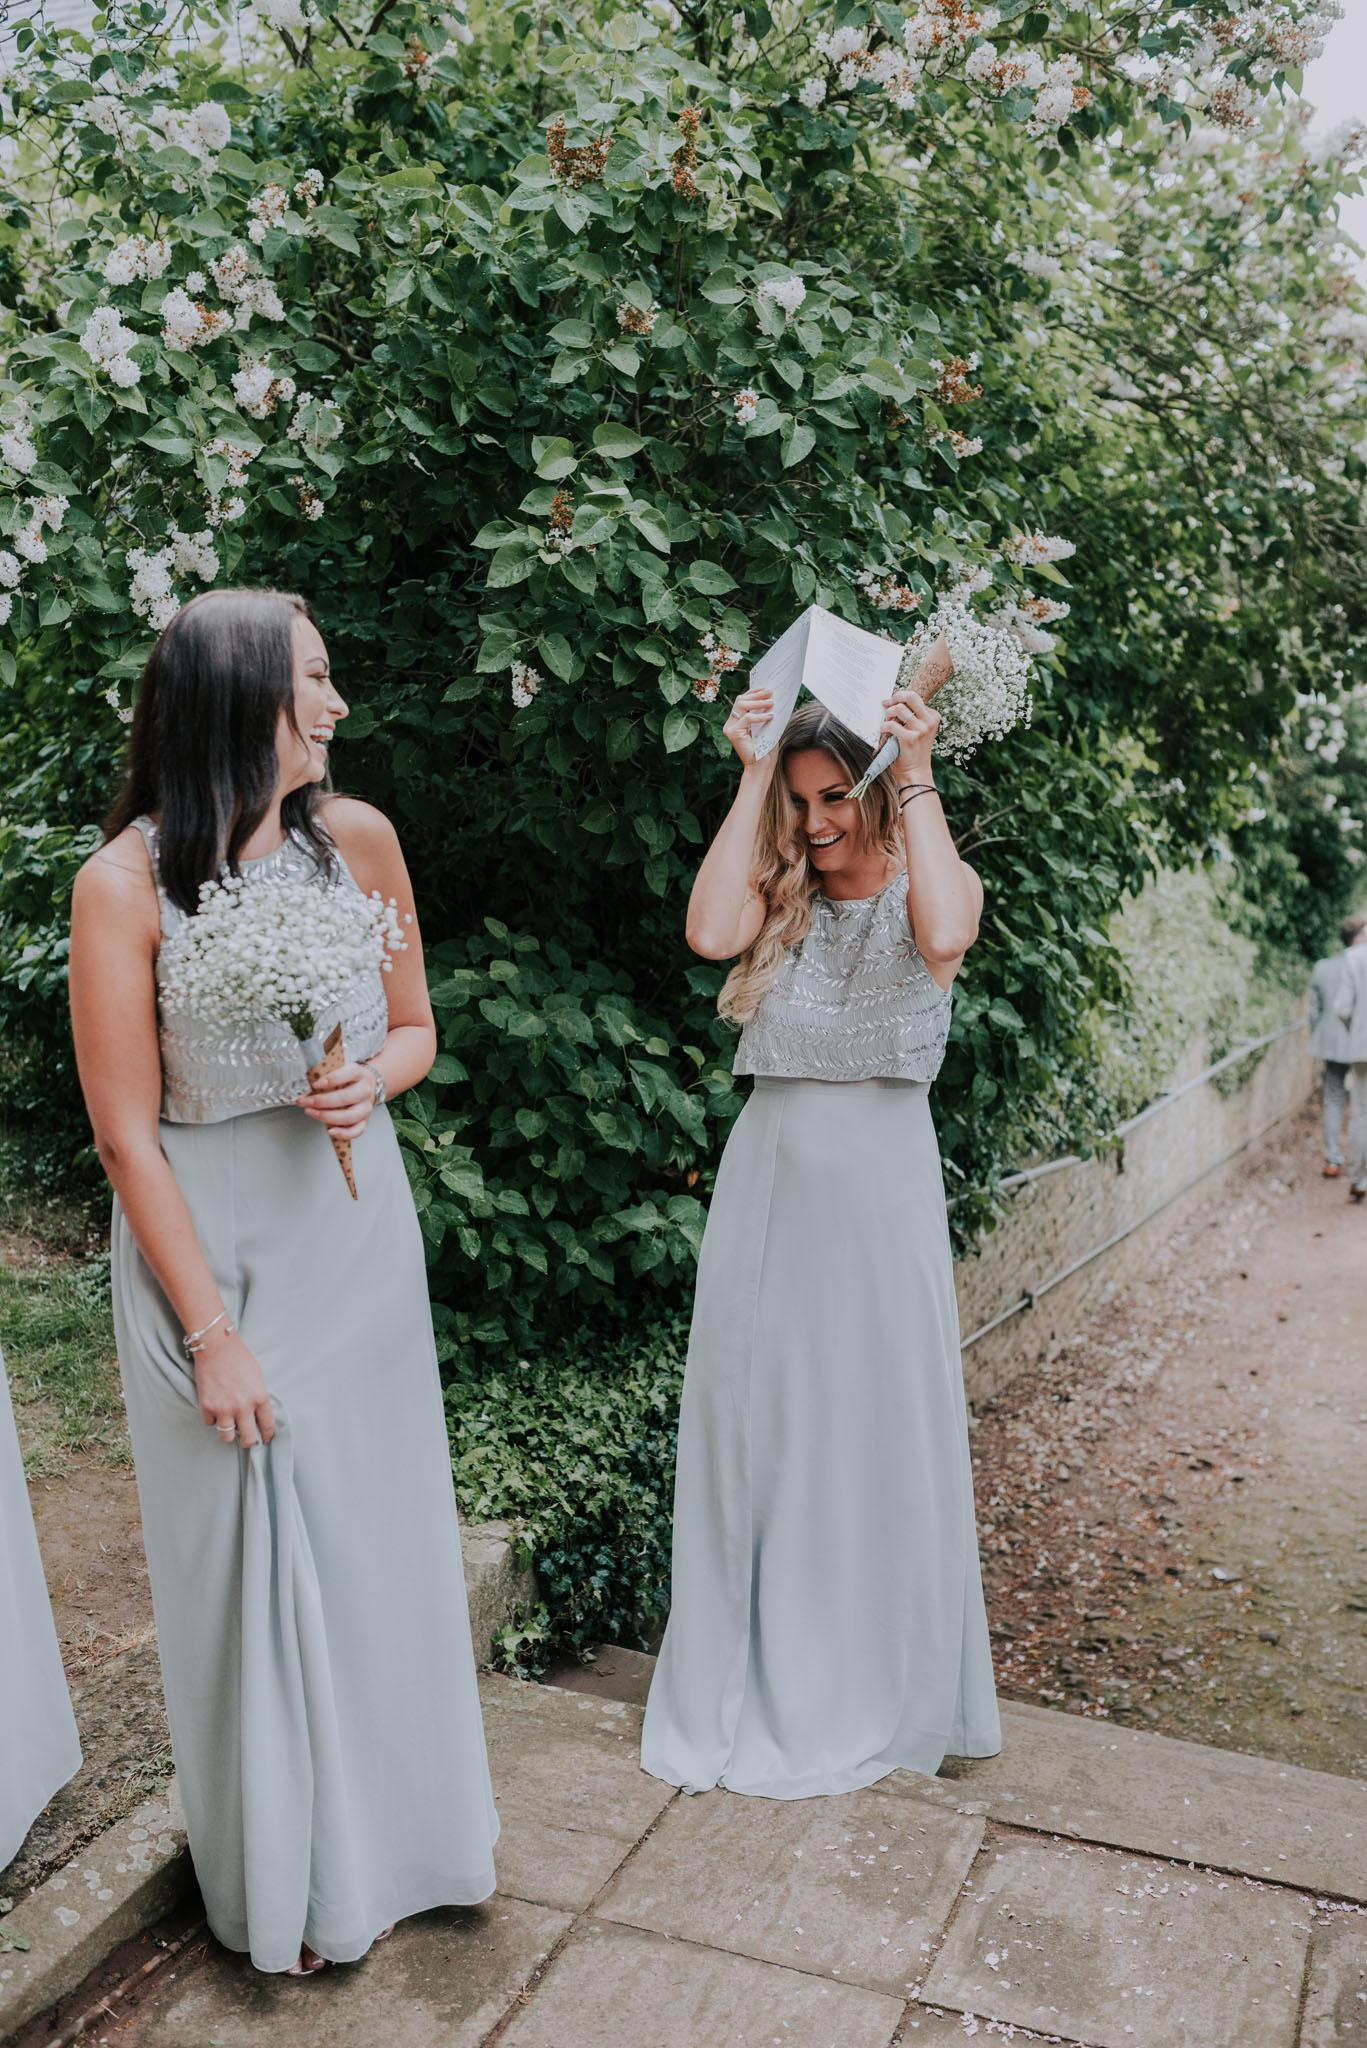 wedding-photographer-glewstone-court-hereford-scott-stockwell-photography273.jpg